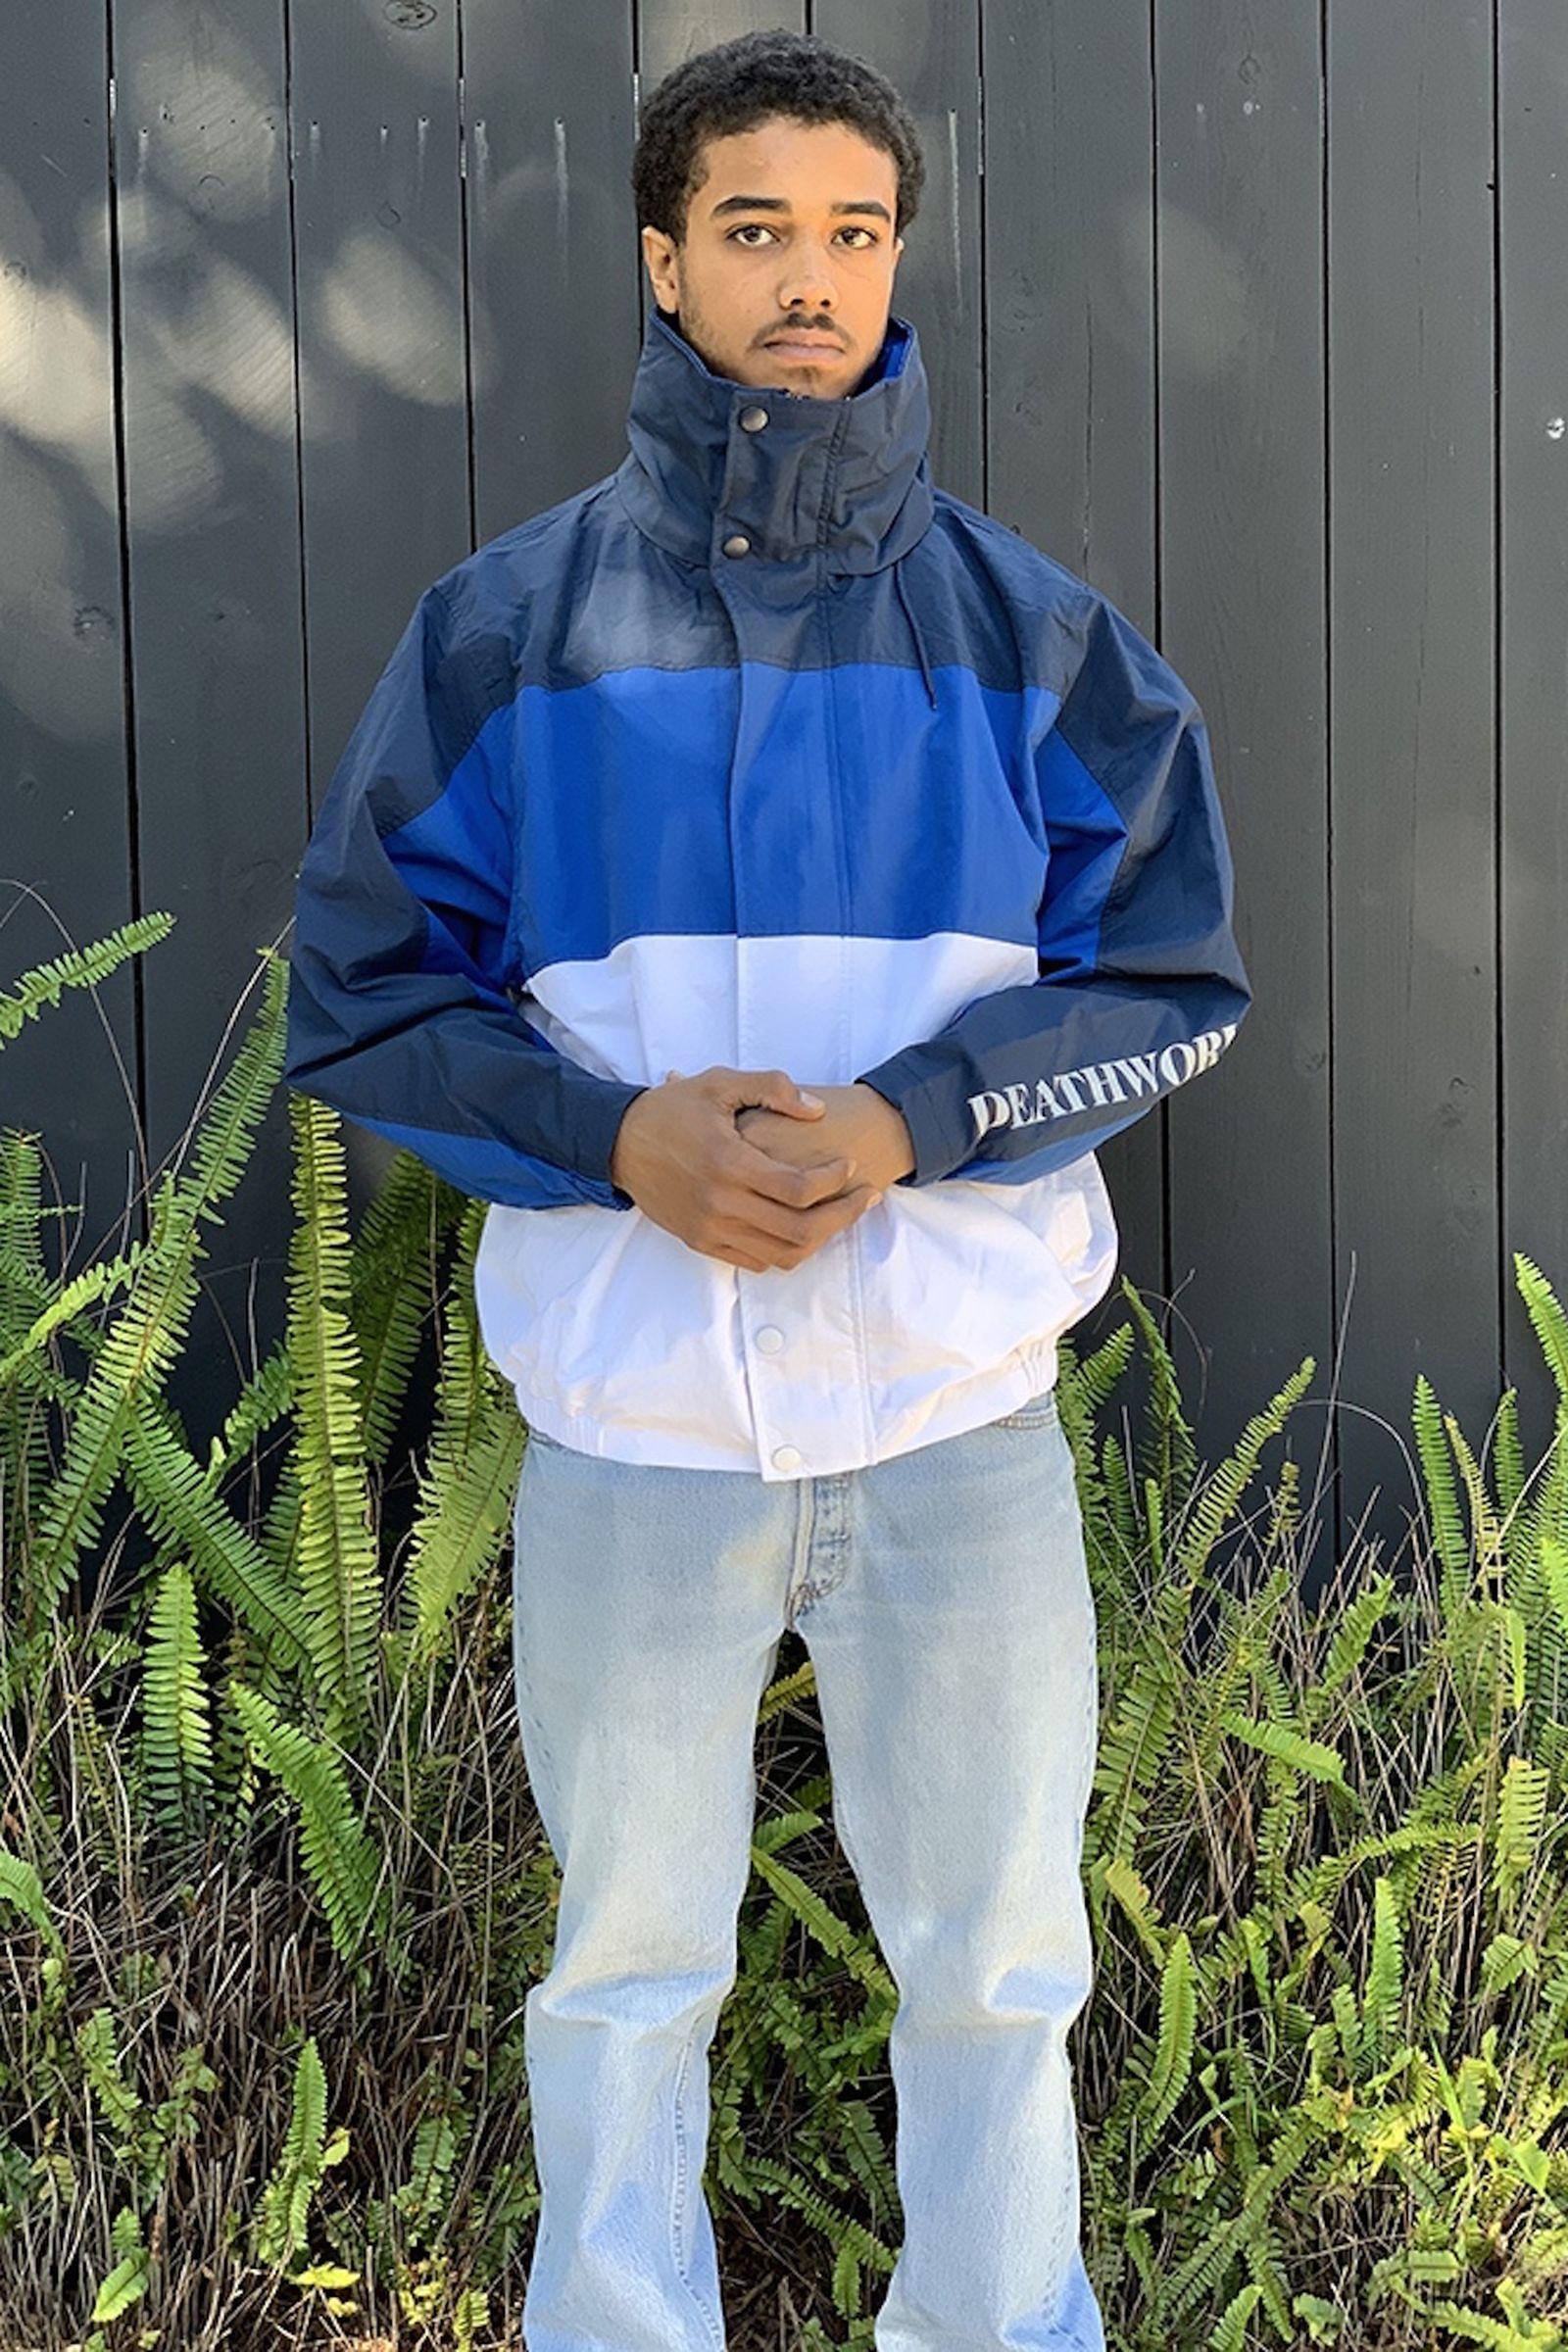 deathworld winter 2019 collection Earl Sweatshirt